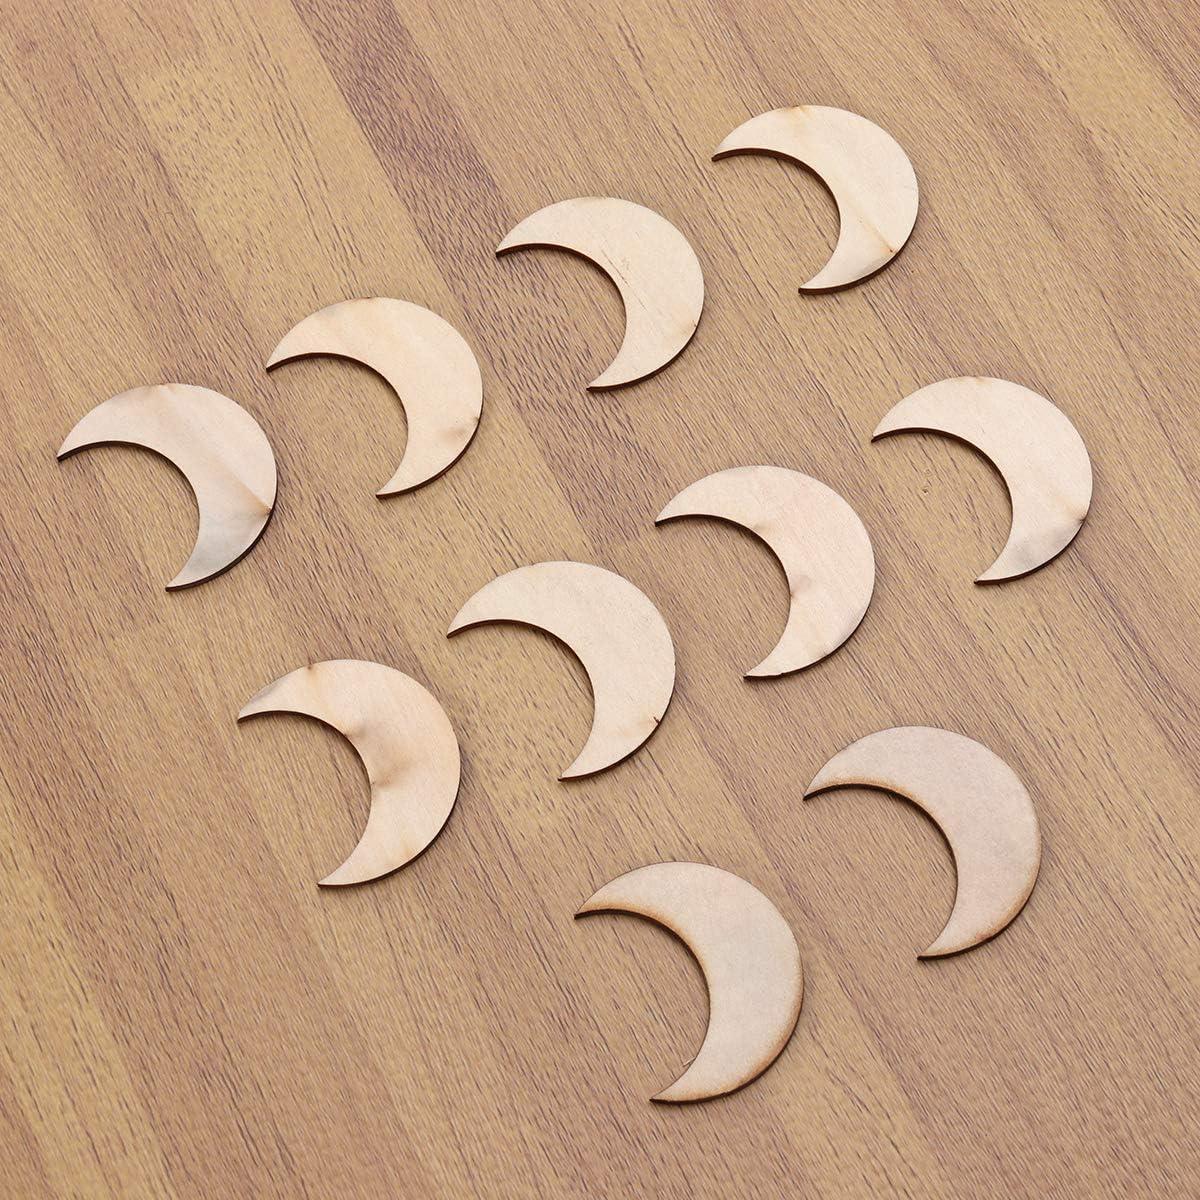 Amosfun Holz Mond Holzscheiben Scrapbooking DIY Holzst/ücke 52 mm 20 St/ück